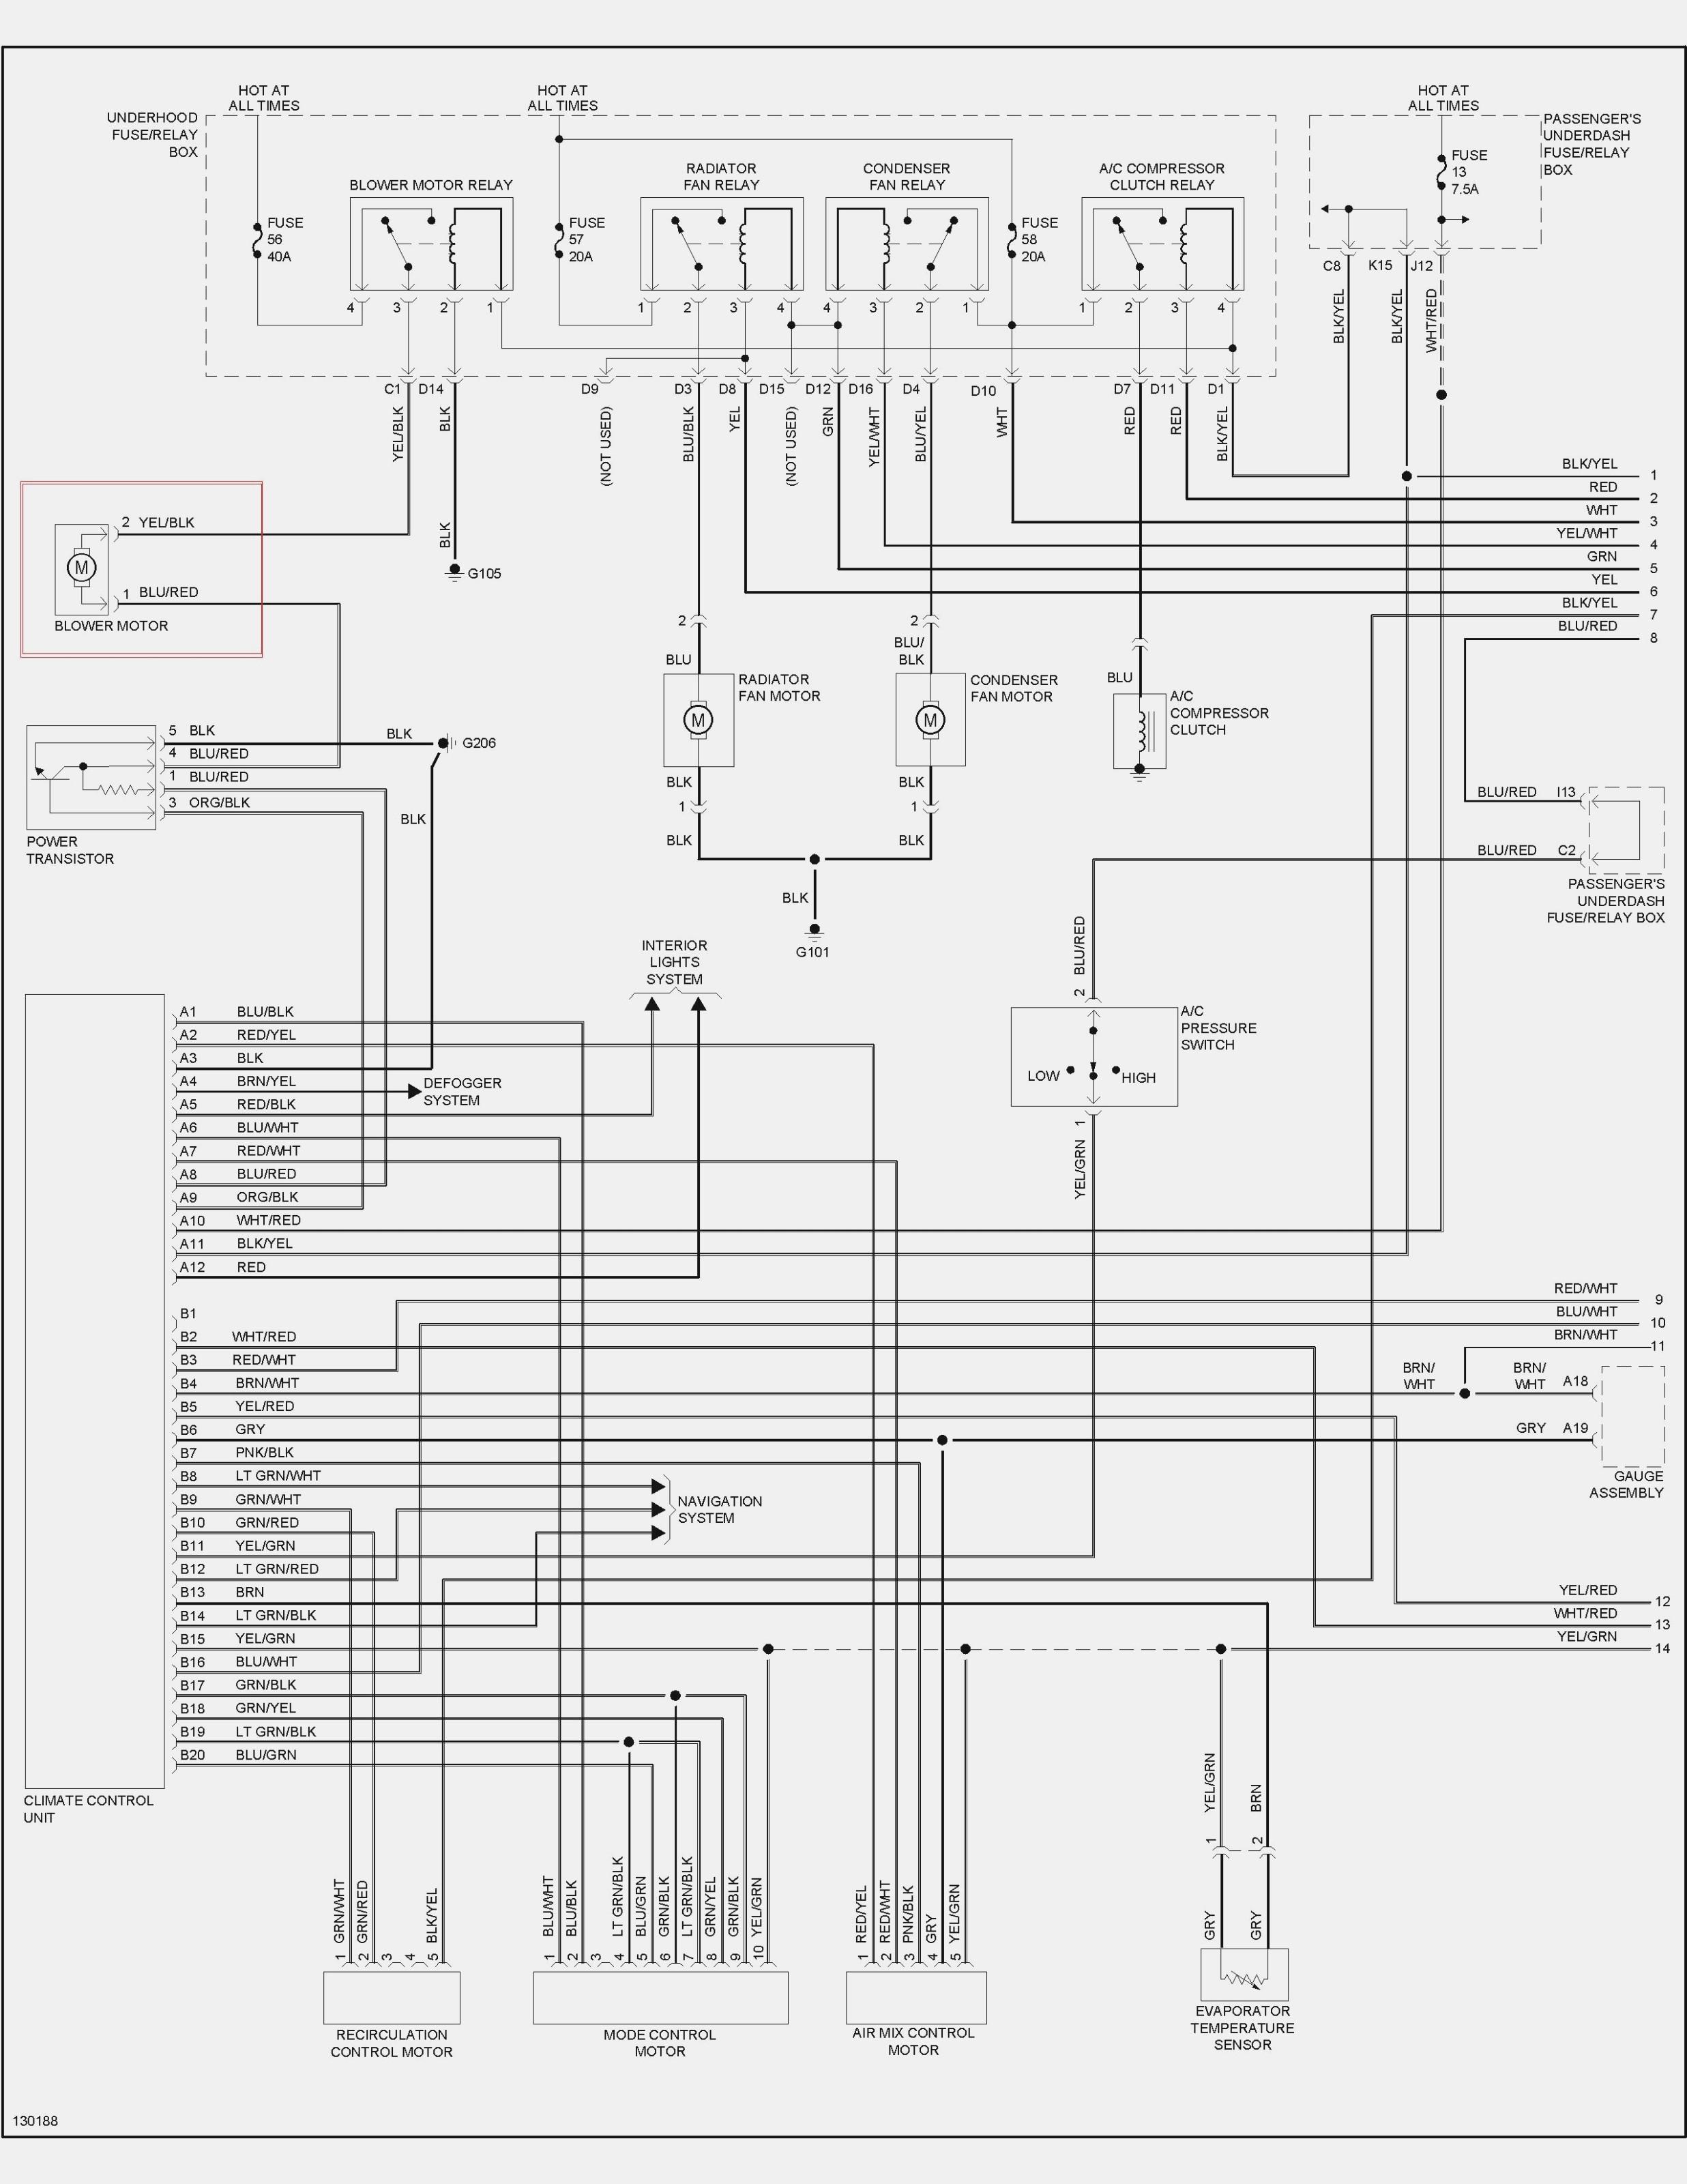 2000 Acura Tl Engine Diagram 2005 Acura Wiring Diagram Wiring Diagram Datasource Of 2000 Acura Tl Engine Diagram